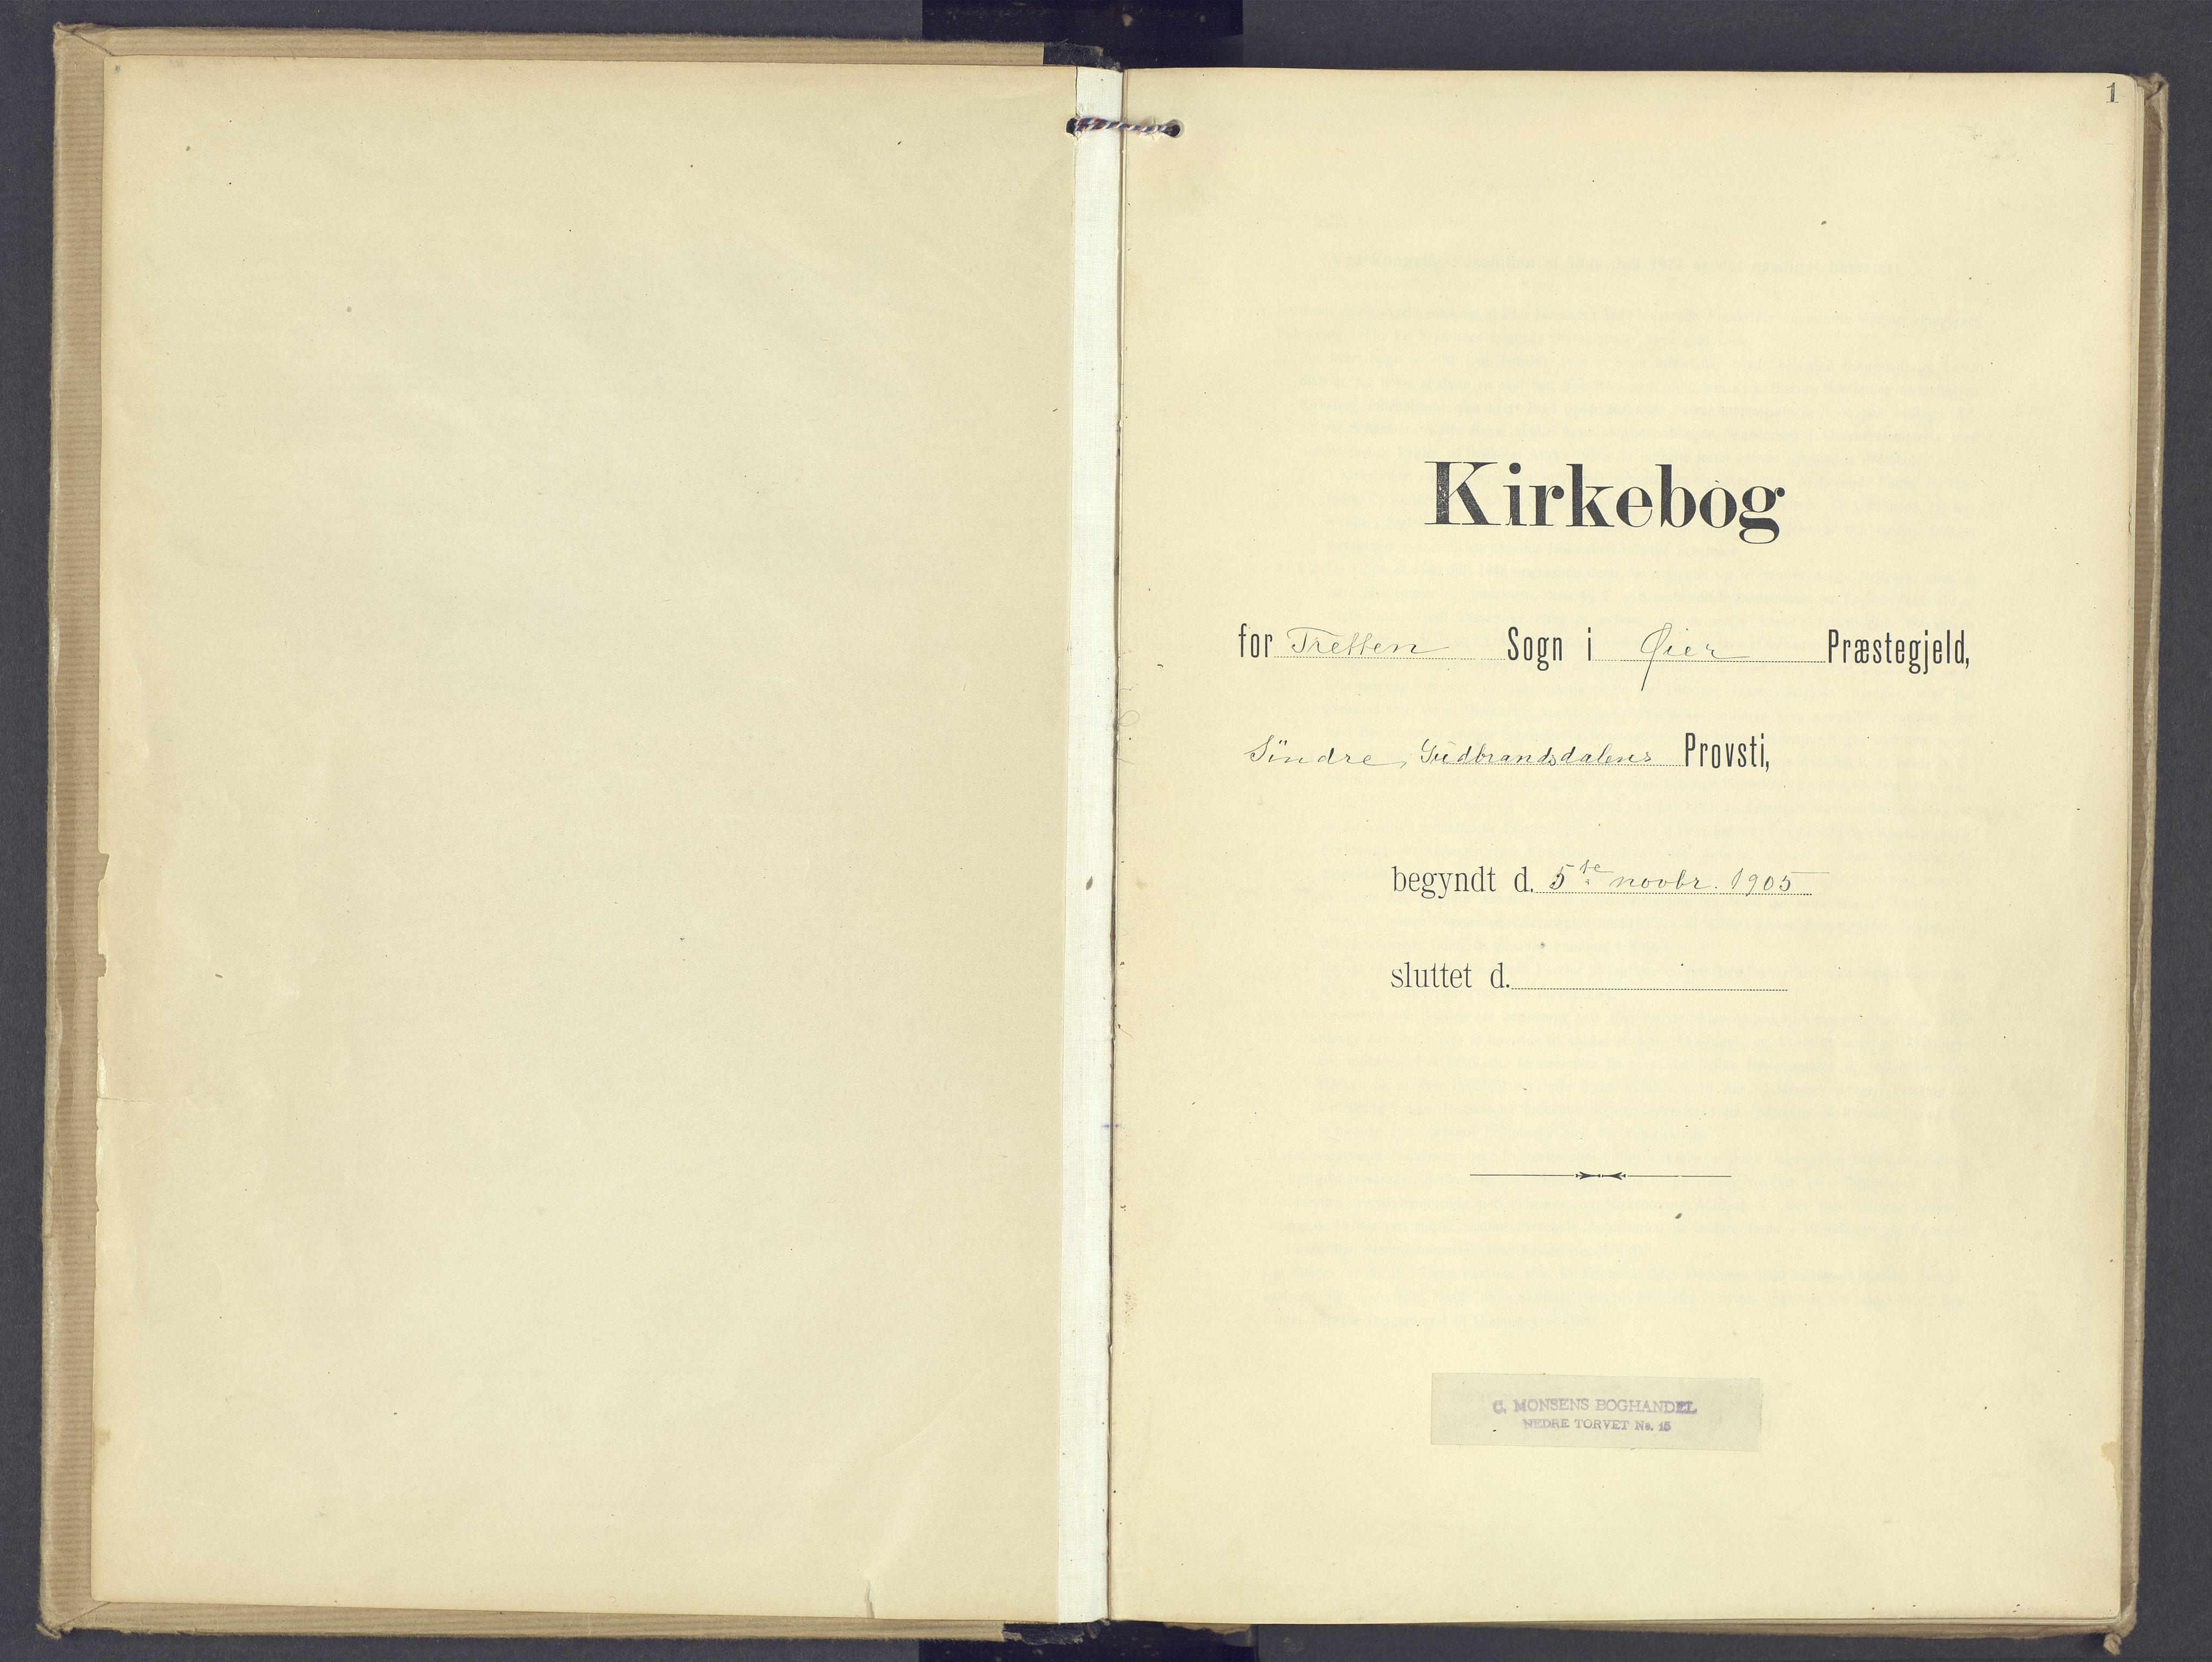 SAH, Øyer prestekontor, Ministerialbok nr. 13, 1905-1920, s. 1